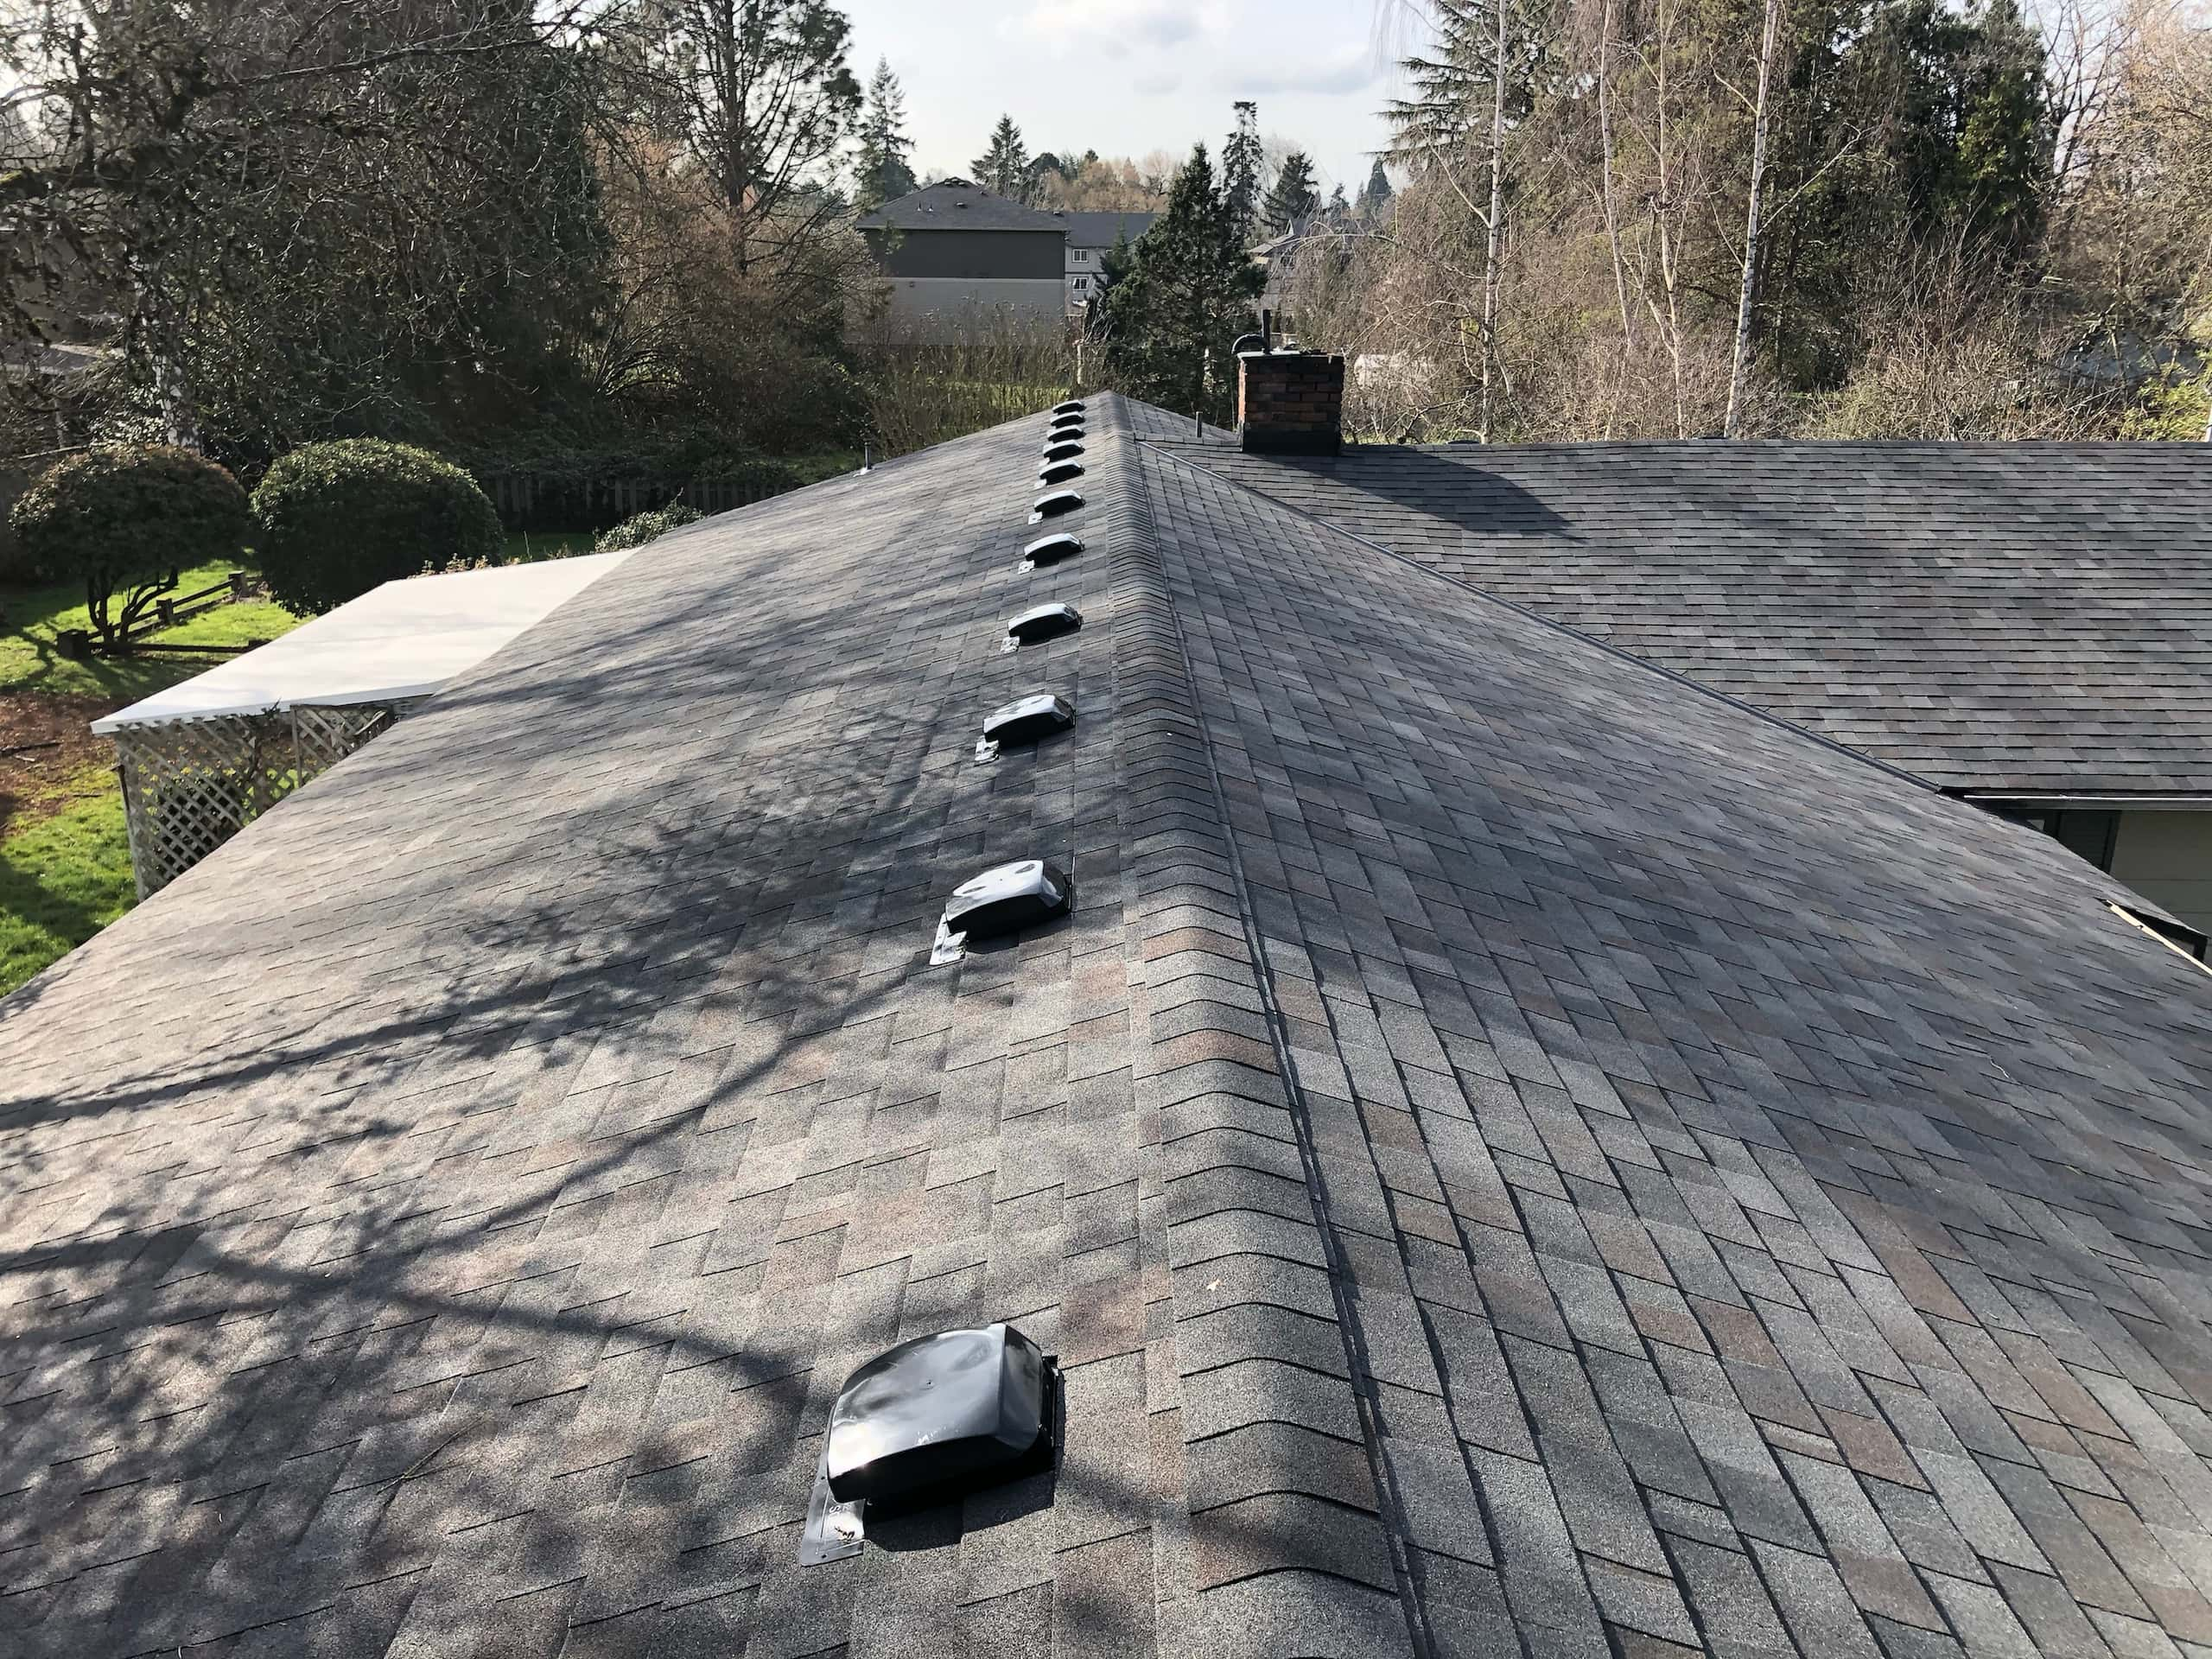 Reliance Roof Pros | West Linn | New Roof | Malarkey Vista AR in Black Oak | Best Local Roofing Company